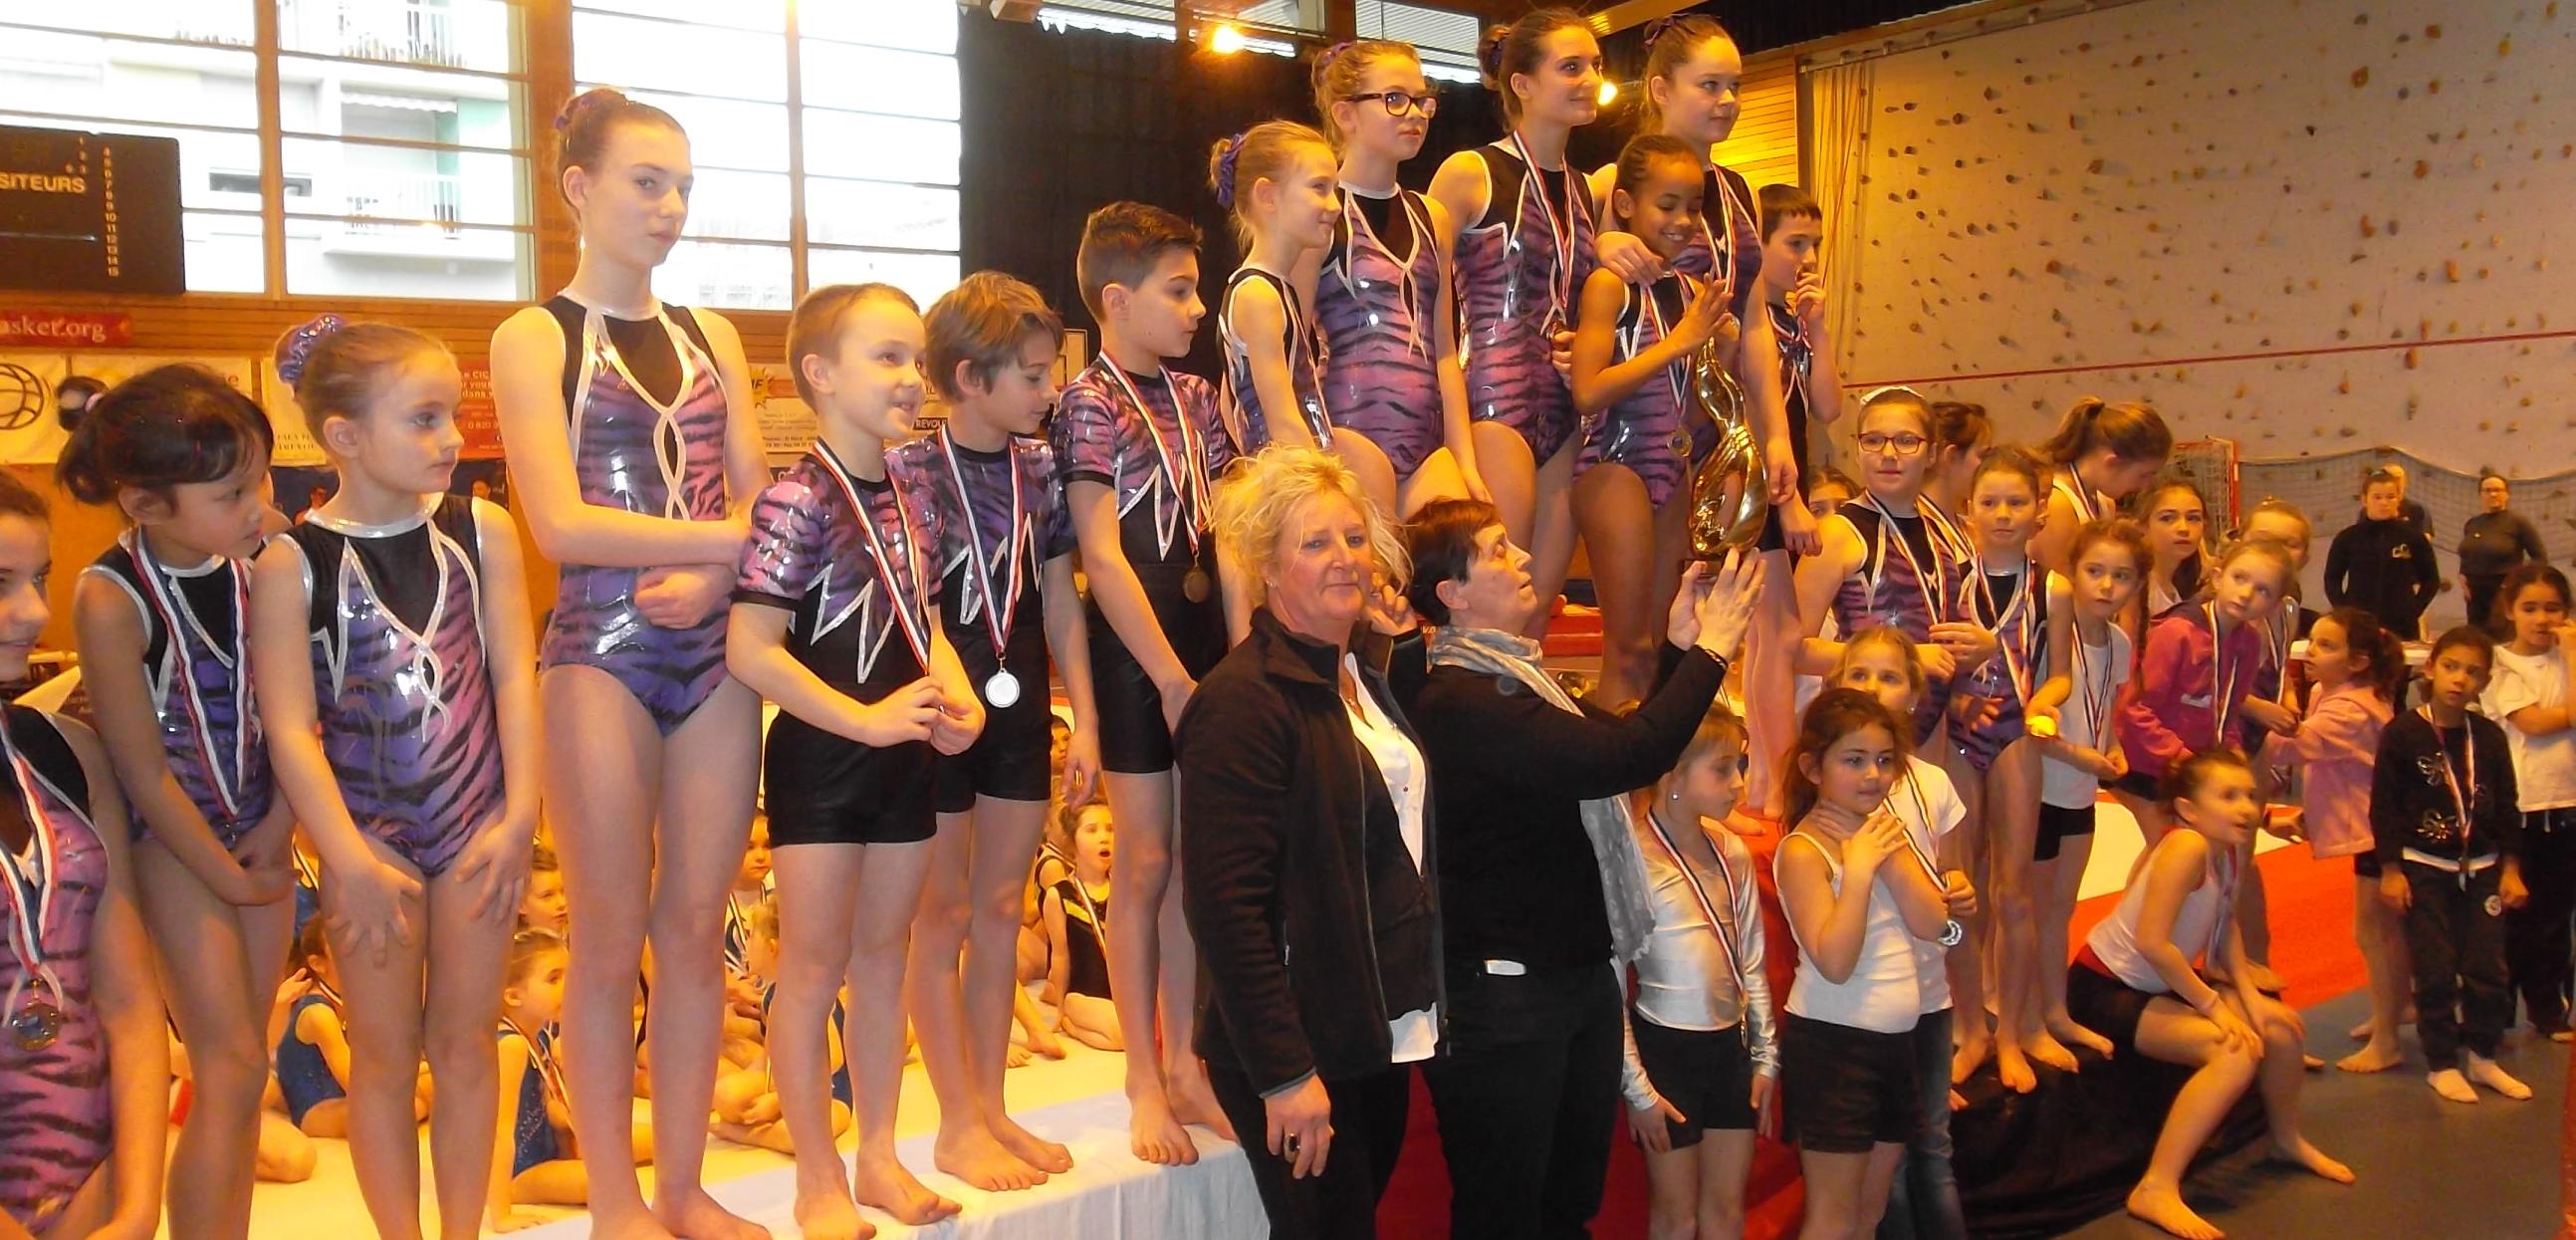 Championnat départemental indiv GAF GAM et Gymnovice GA GAc - Résultats